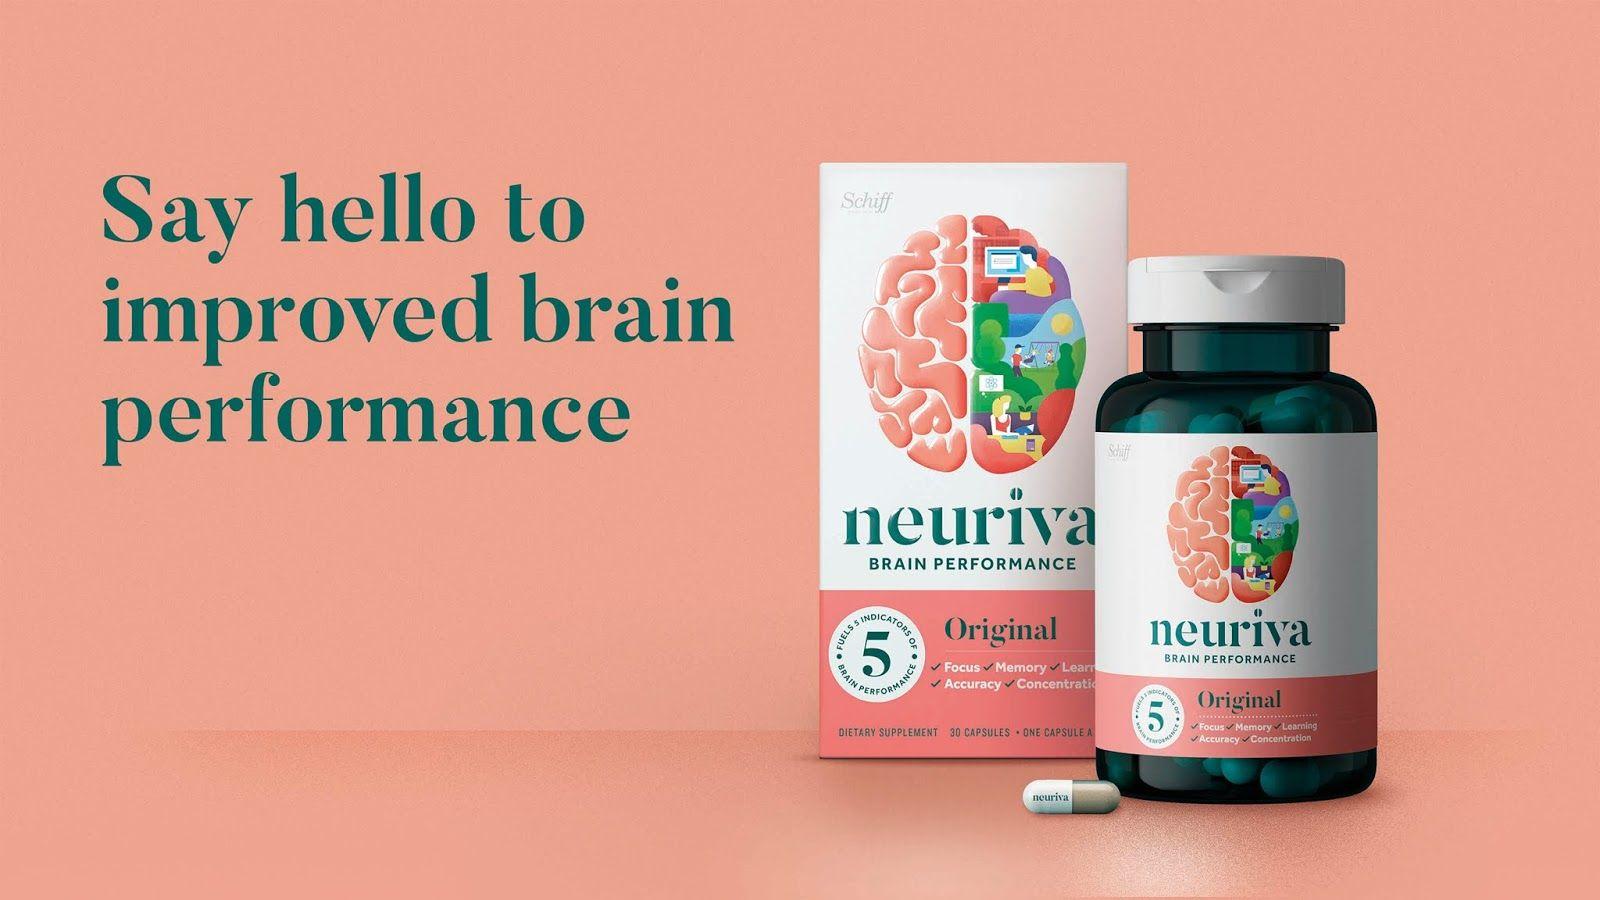 Neuriva Packaging Design Identity Packaging Design Inspiration